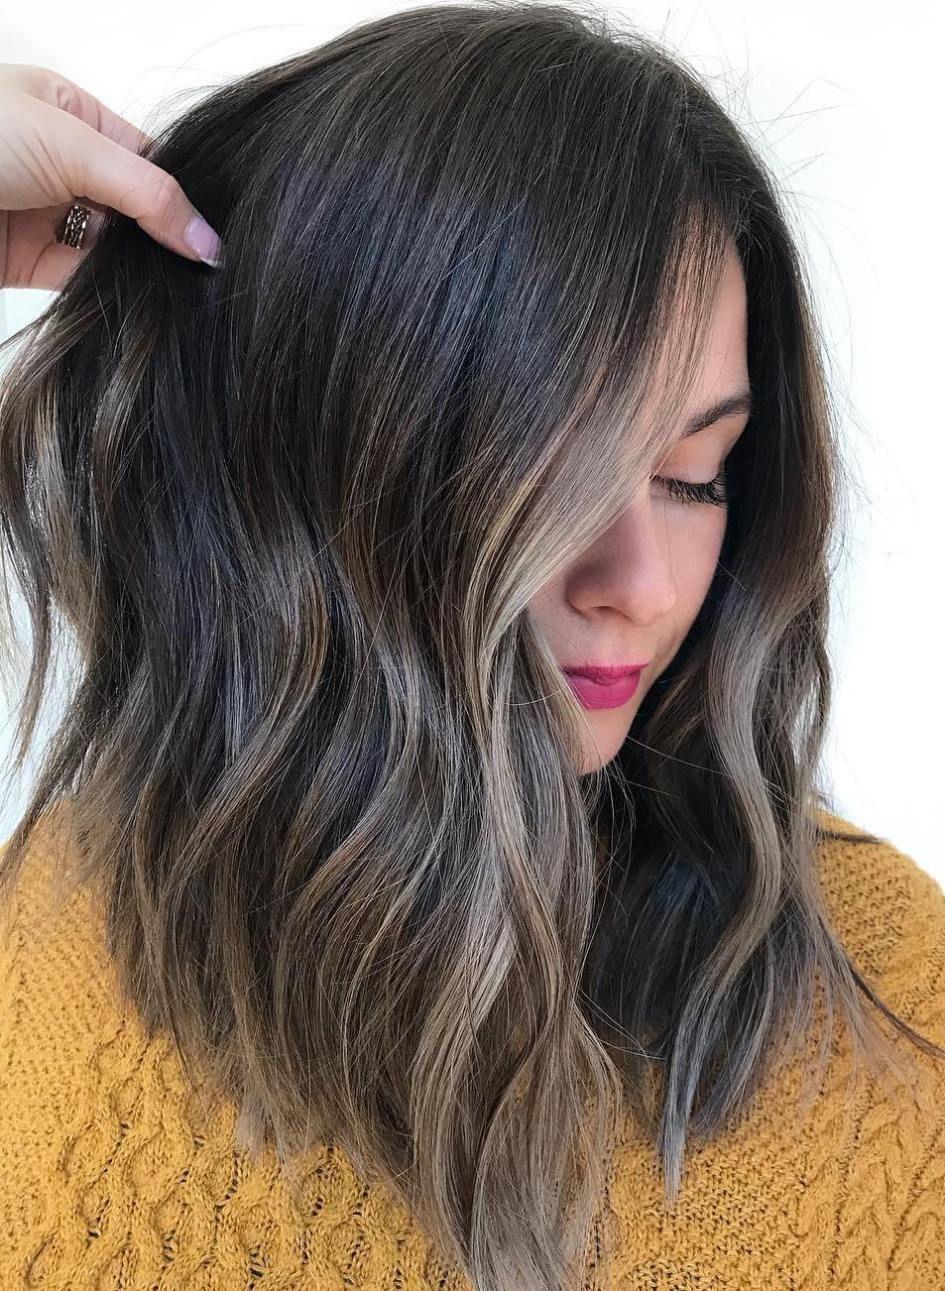 Beige Highlights On Dark Hair Face Framing Brunette Highlights Brownhair Balayagehairda Dark Hair With Highlights Brunette Hair Color Hair Highlights